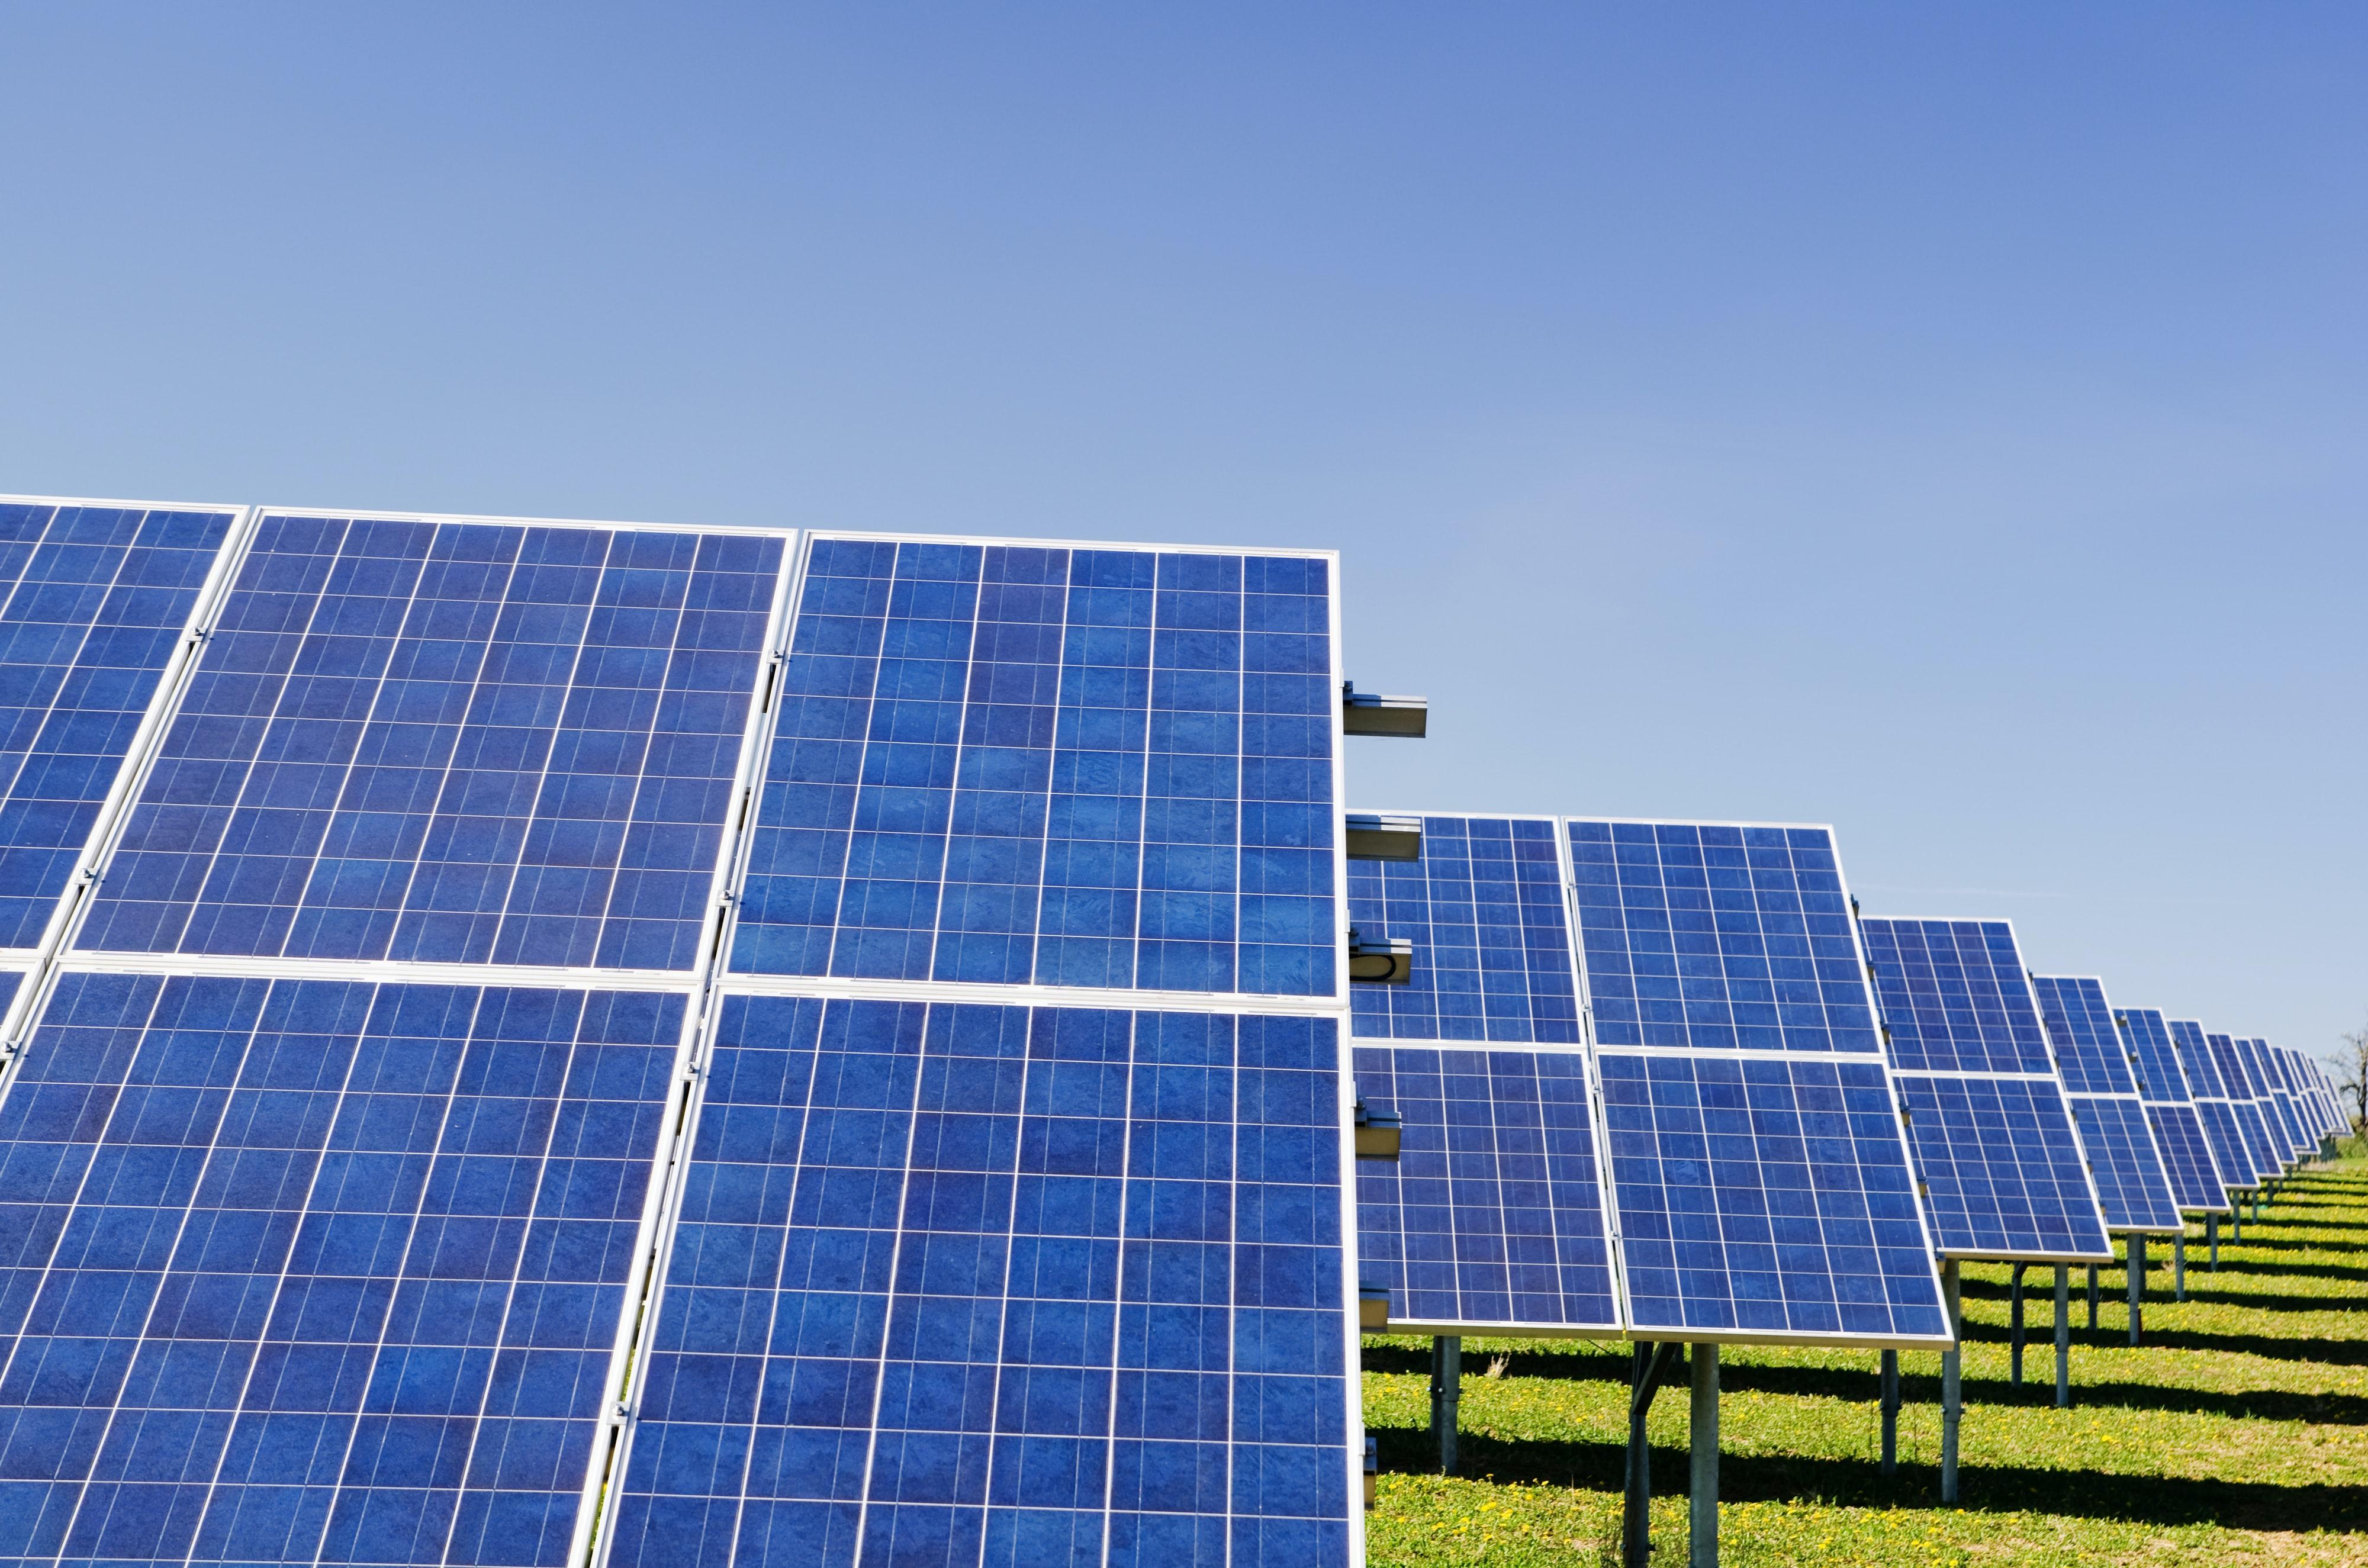 Bhadla Solar - India